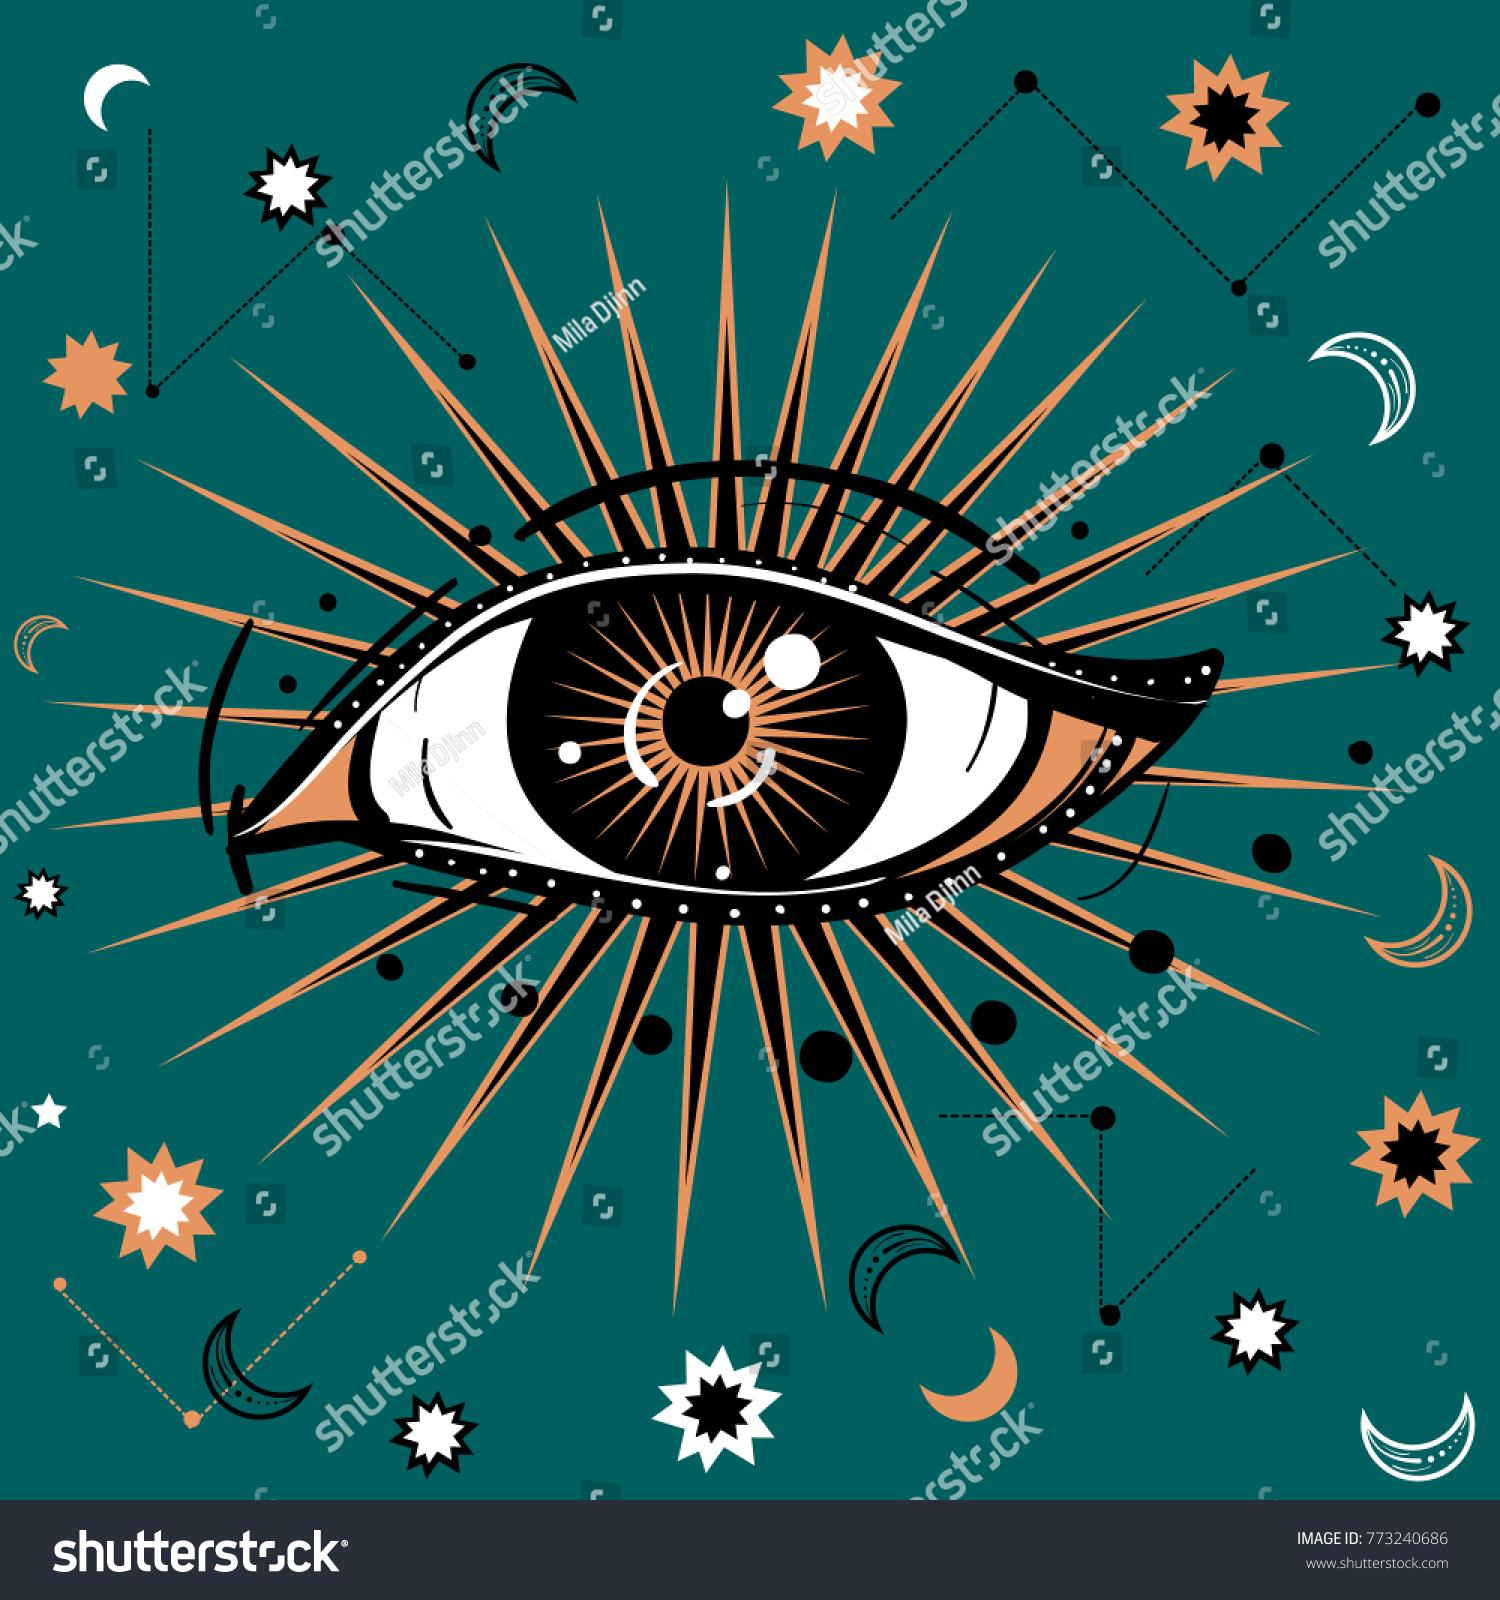 Vector illustration allseeing eye symbol celestial stock vector vector illustration with all seeing eye symbol celestial background retro and boho style biocorpaavc